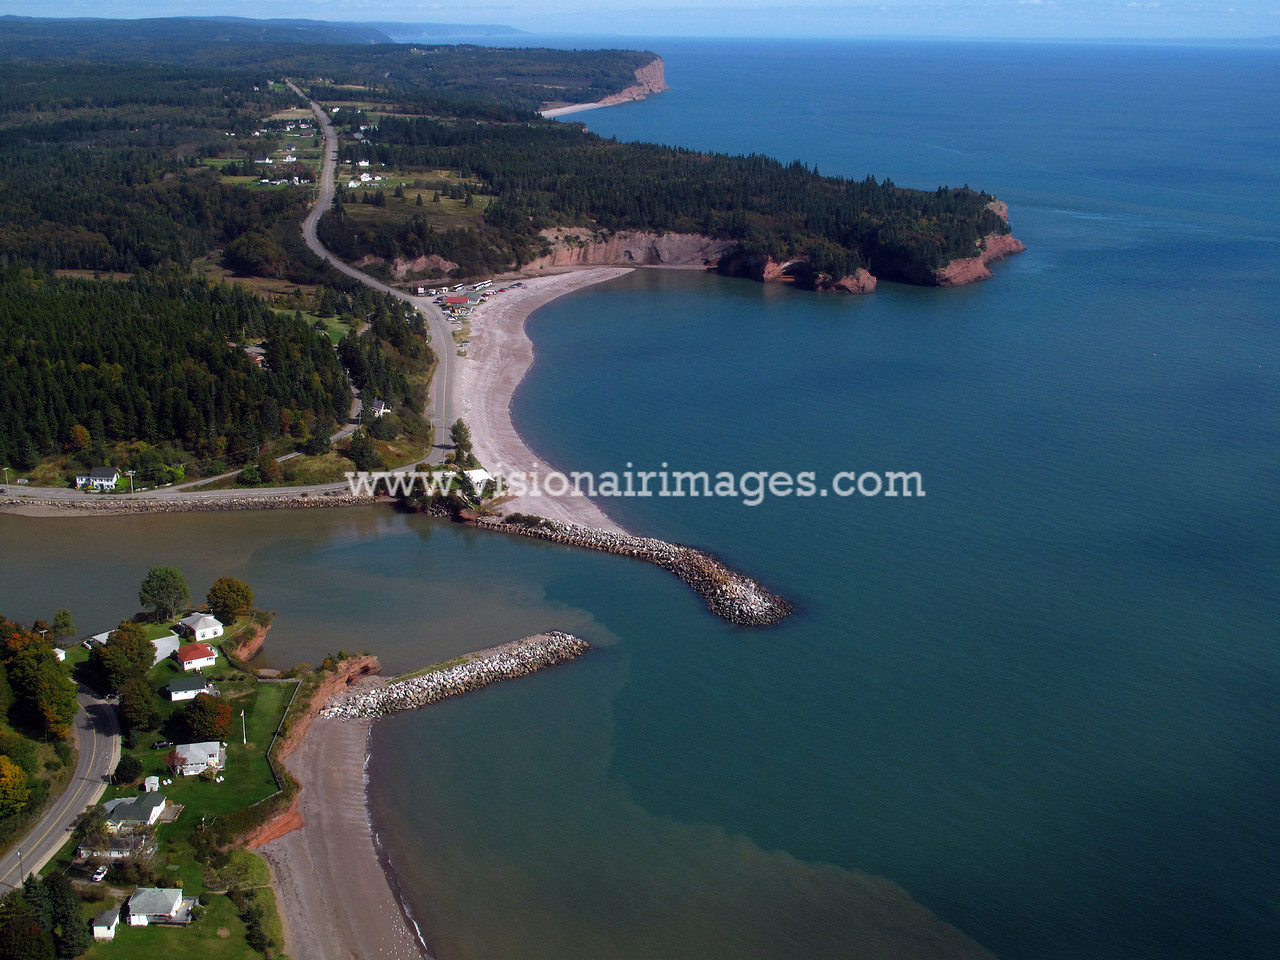 St. Martins, St. Martins Aerial, near Saint John, New Brunswick, Canada